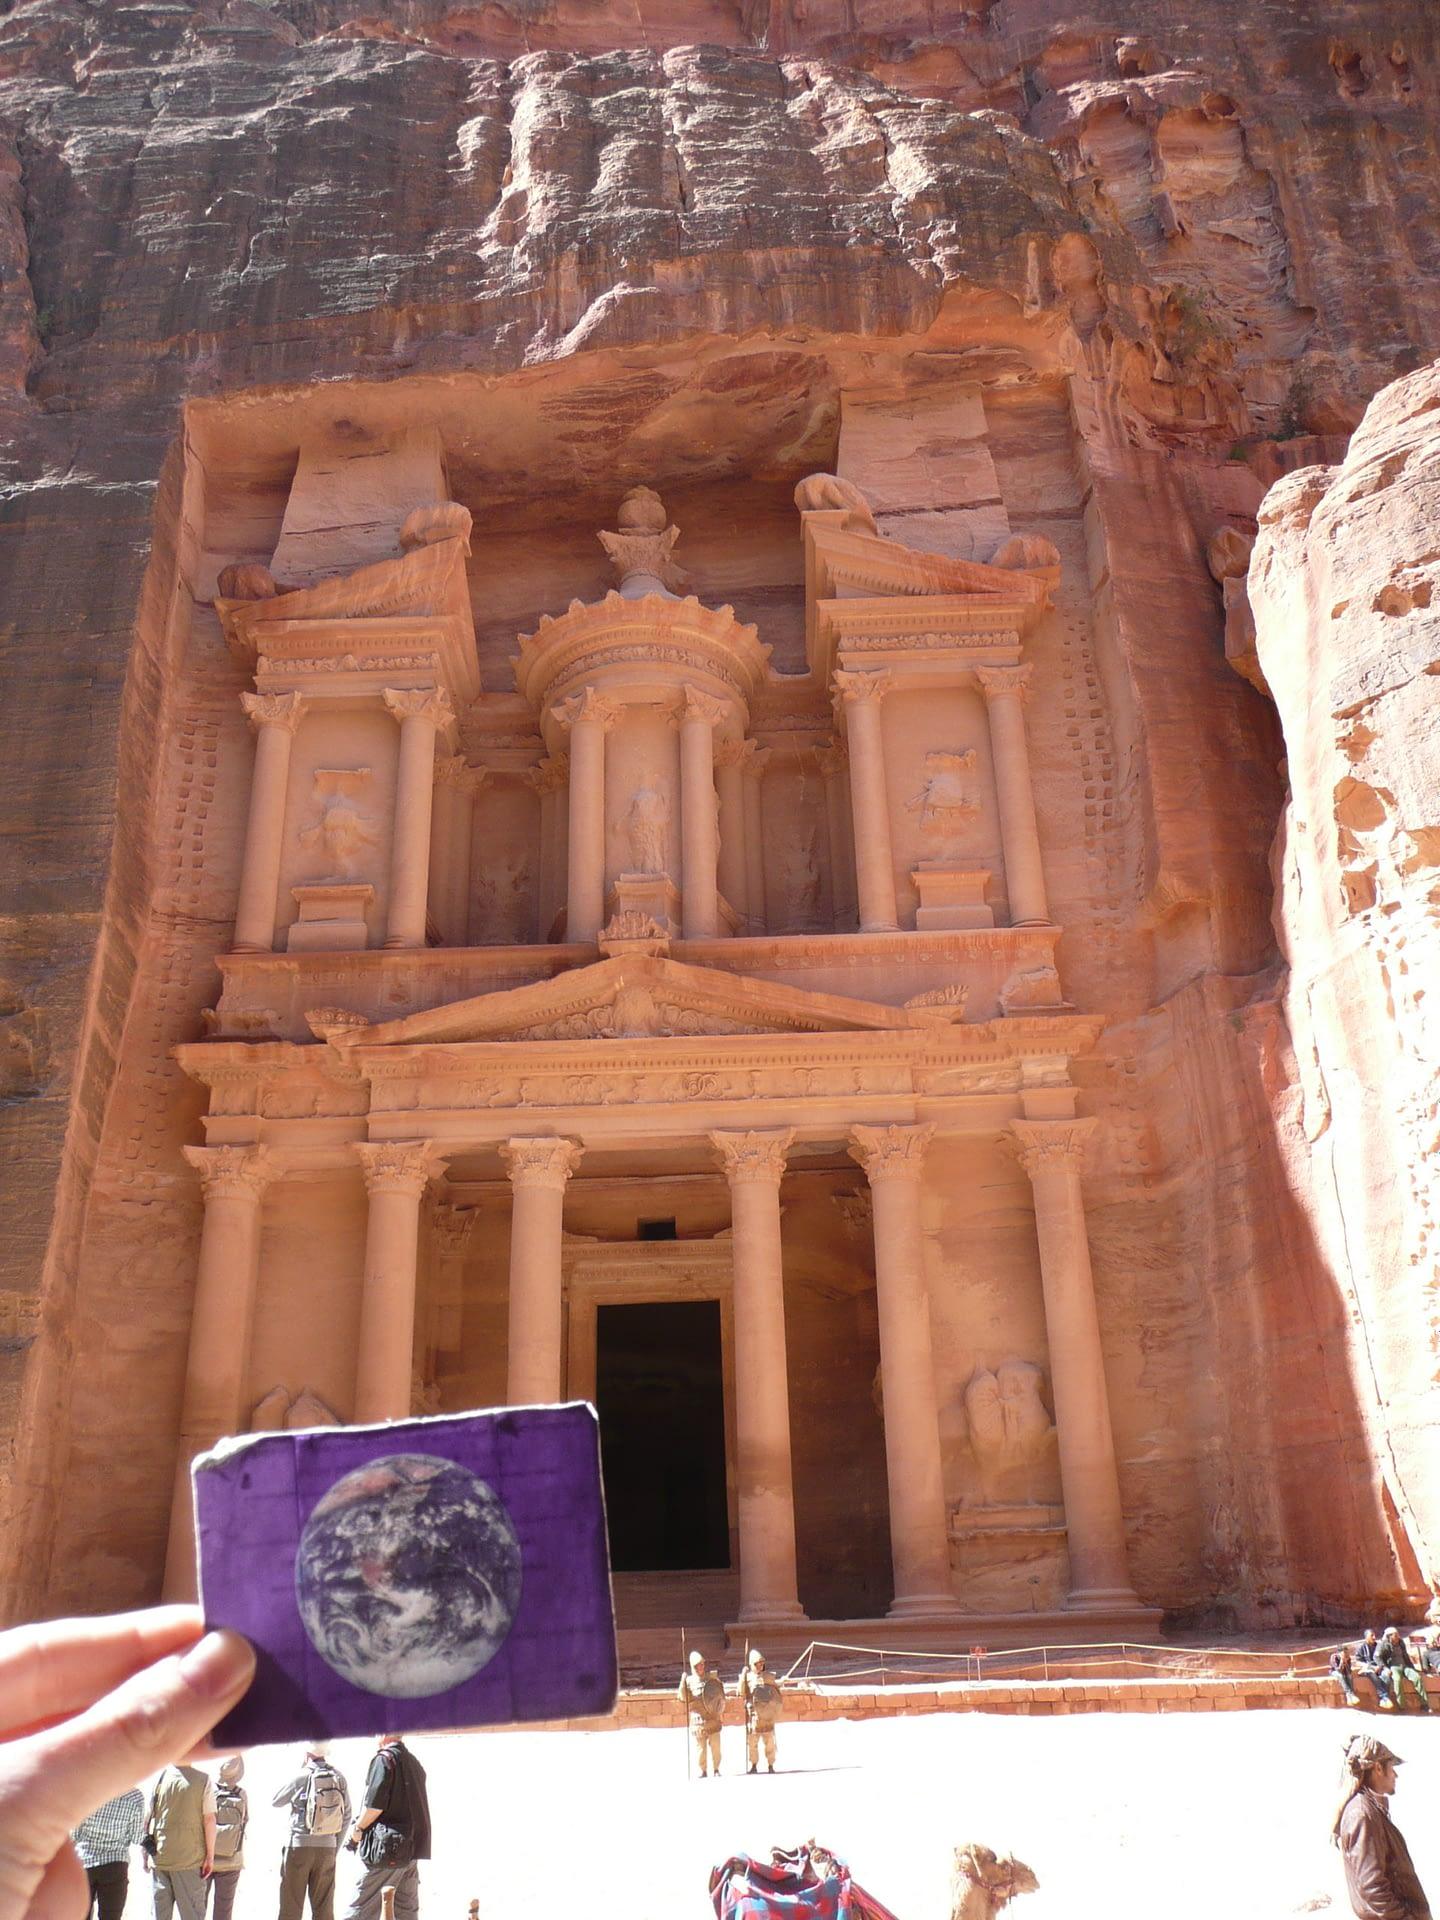 The Treasury (Al Khazeh) at Petra, Jordan was EarthFlagged!